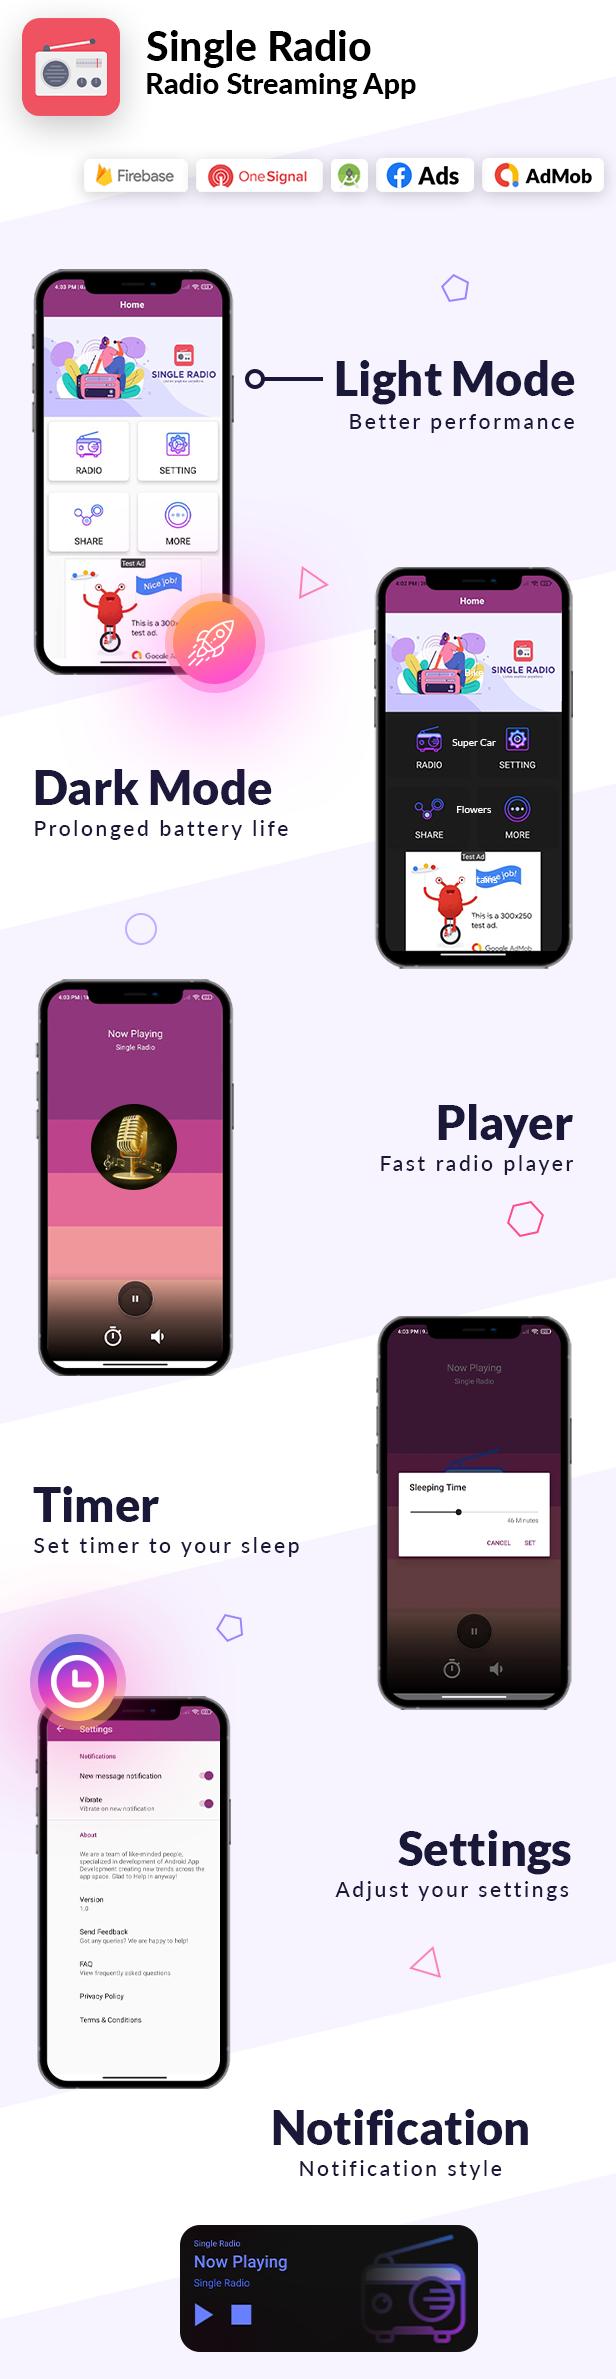 Single Radio App Android   Admob, Facebook, Onesignal - 3